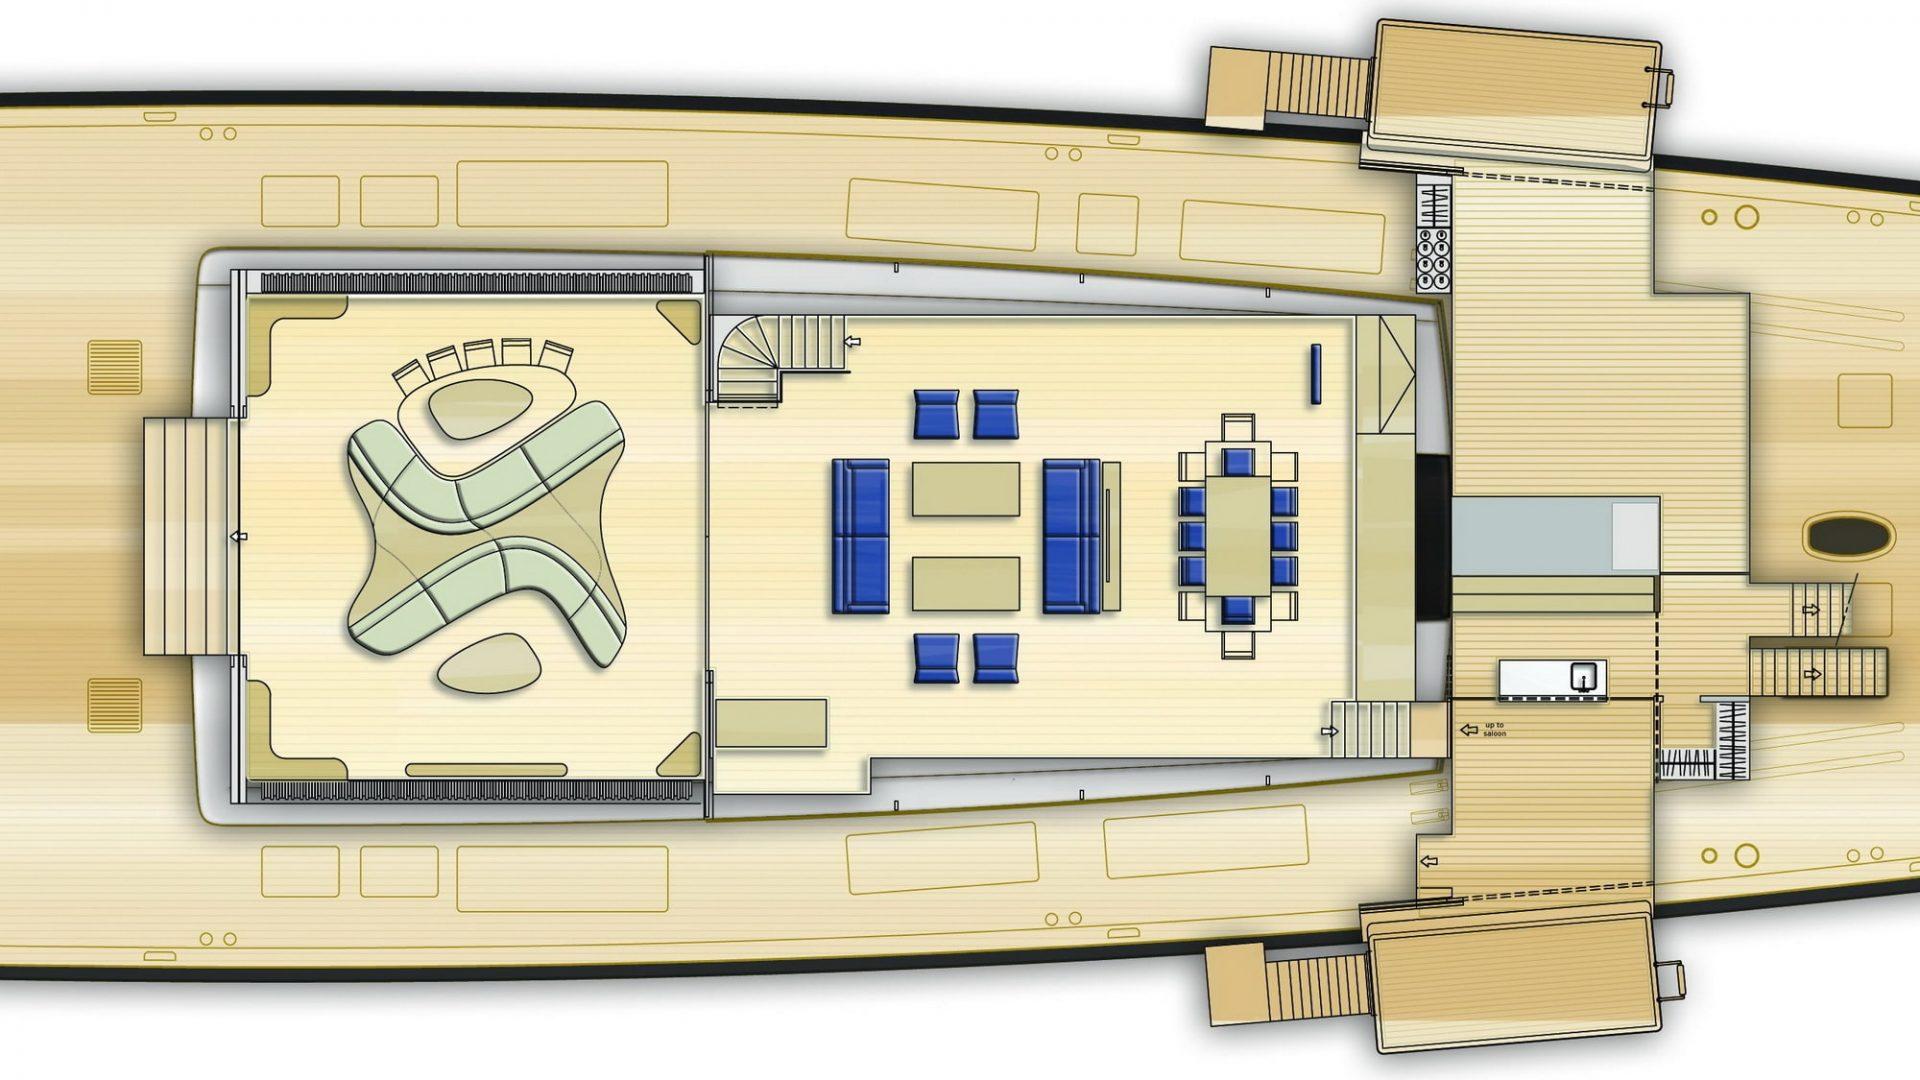 APEX 850 Main deck c2 - Copy2_resize